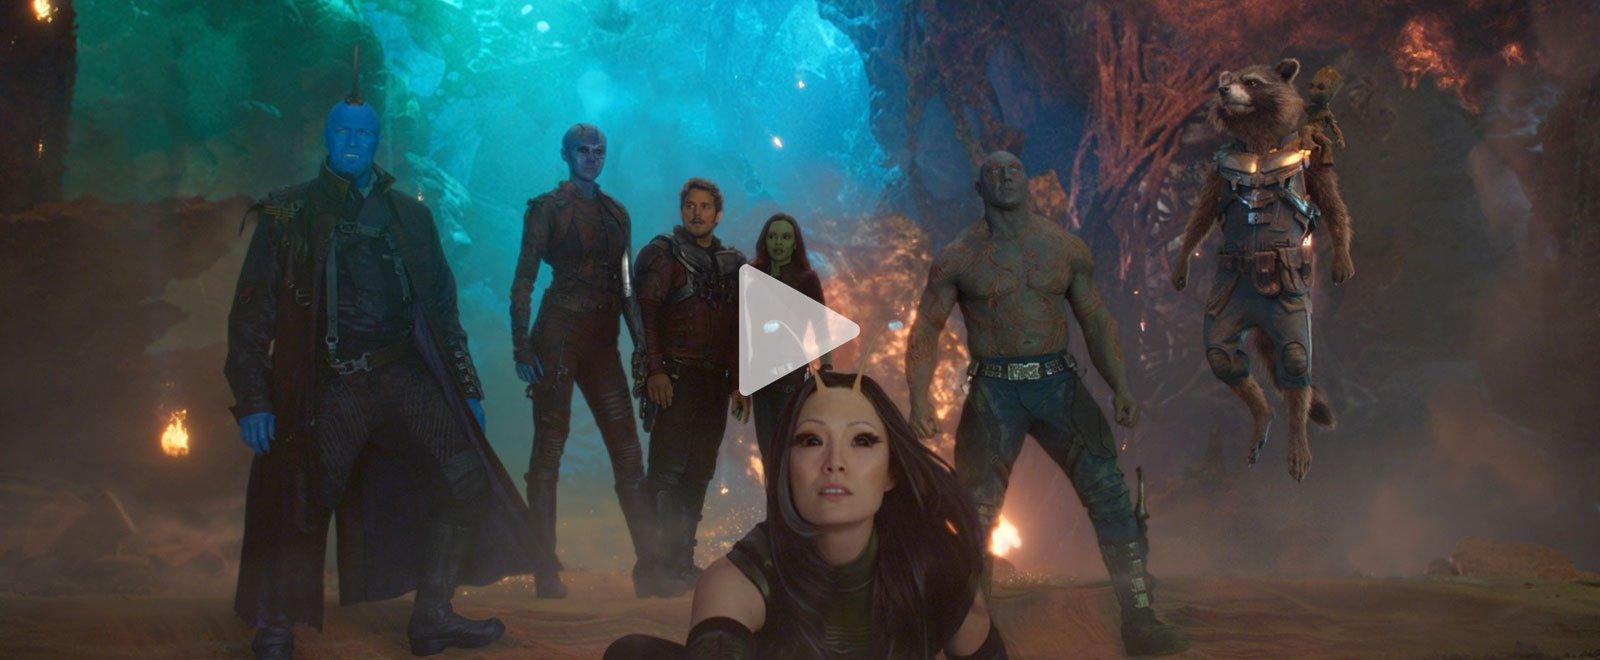 Вартові Галактики 2 / Guardians of the Galaxy Vol. 2 (2017)